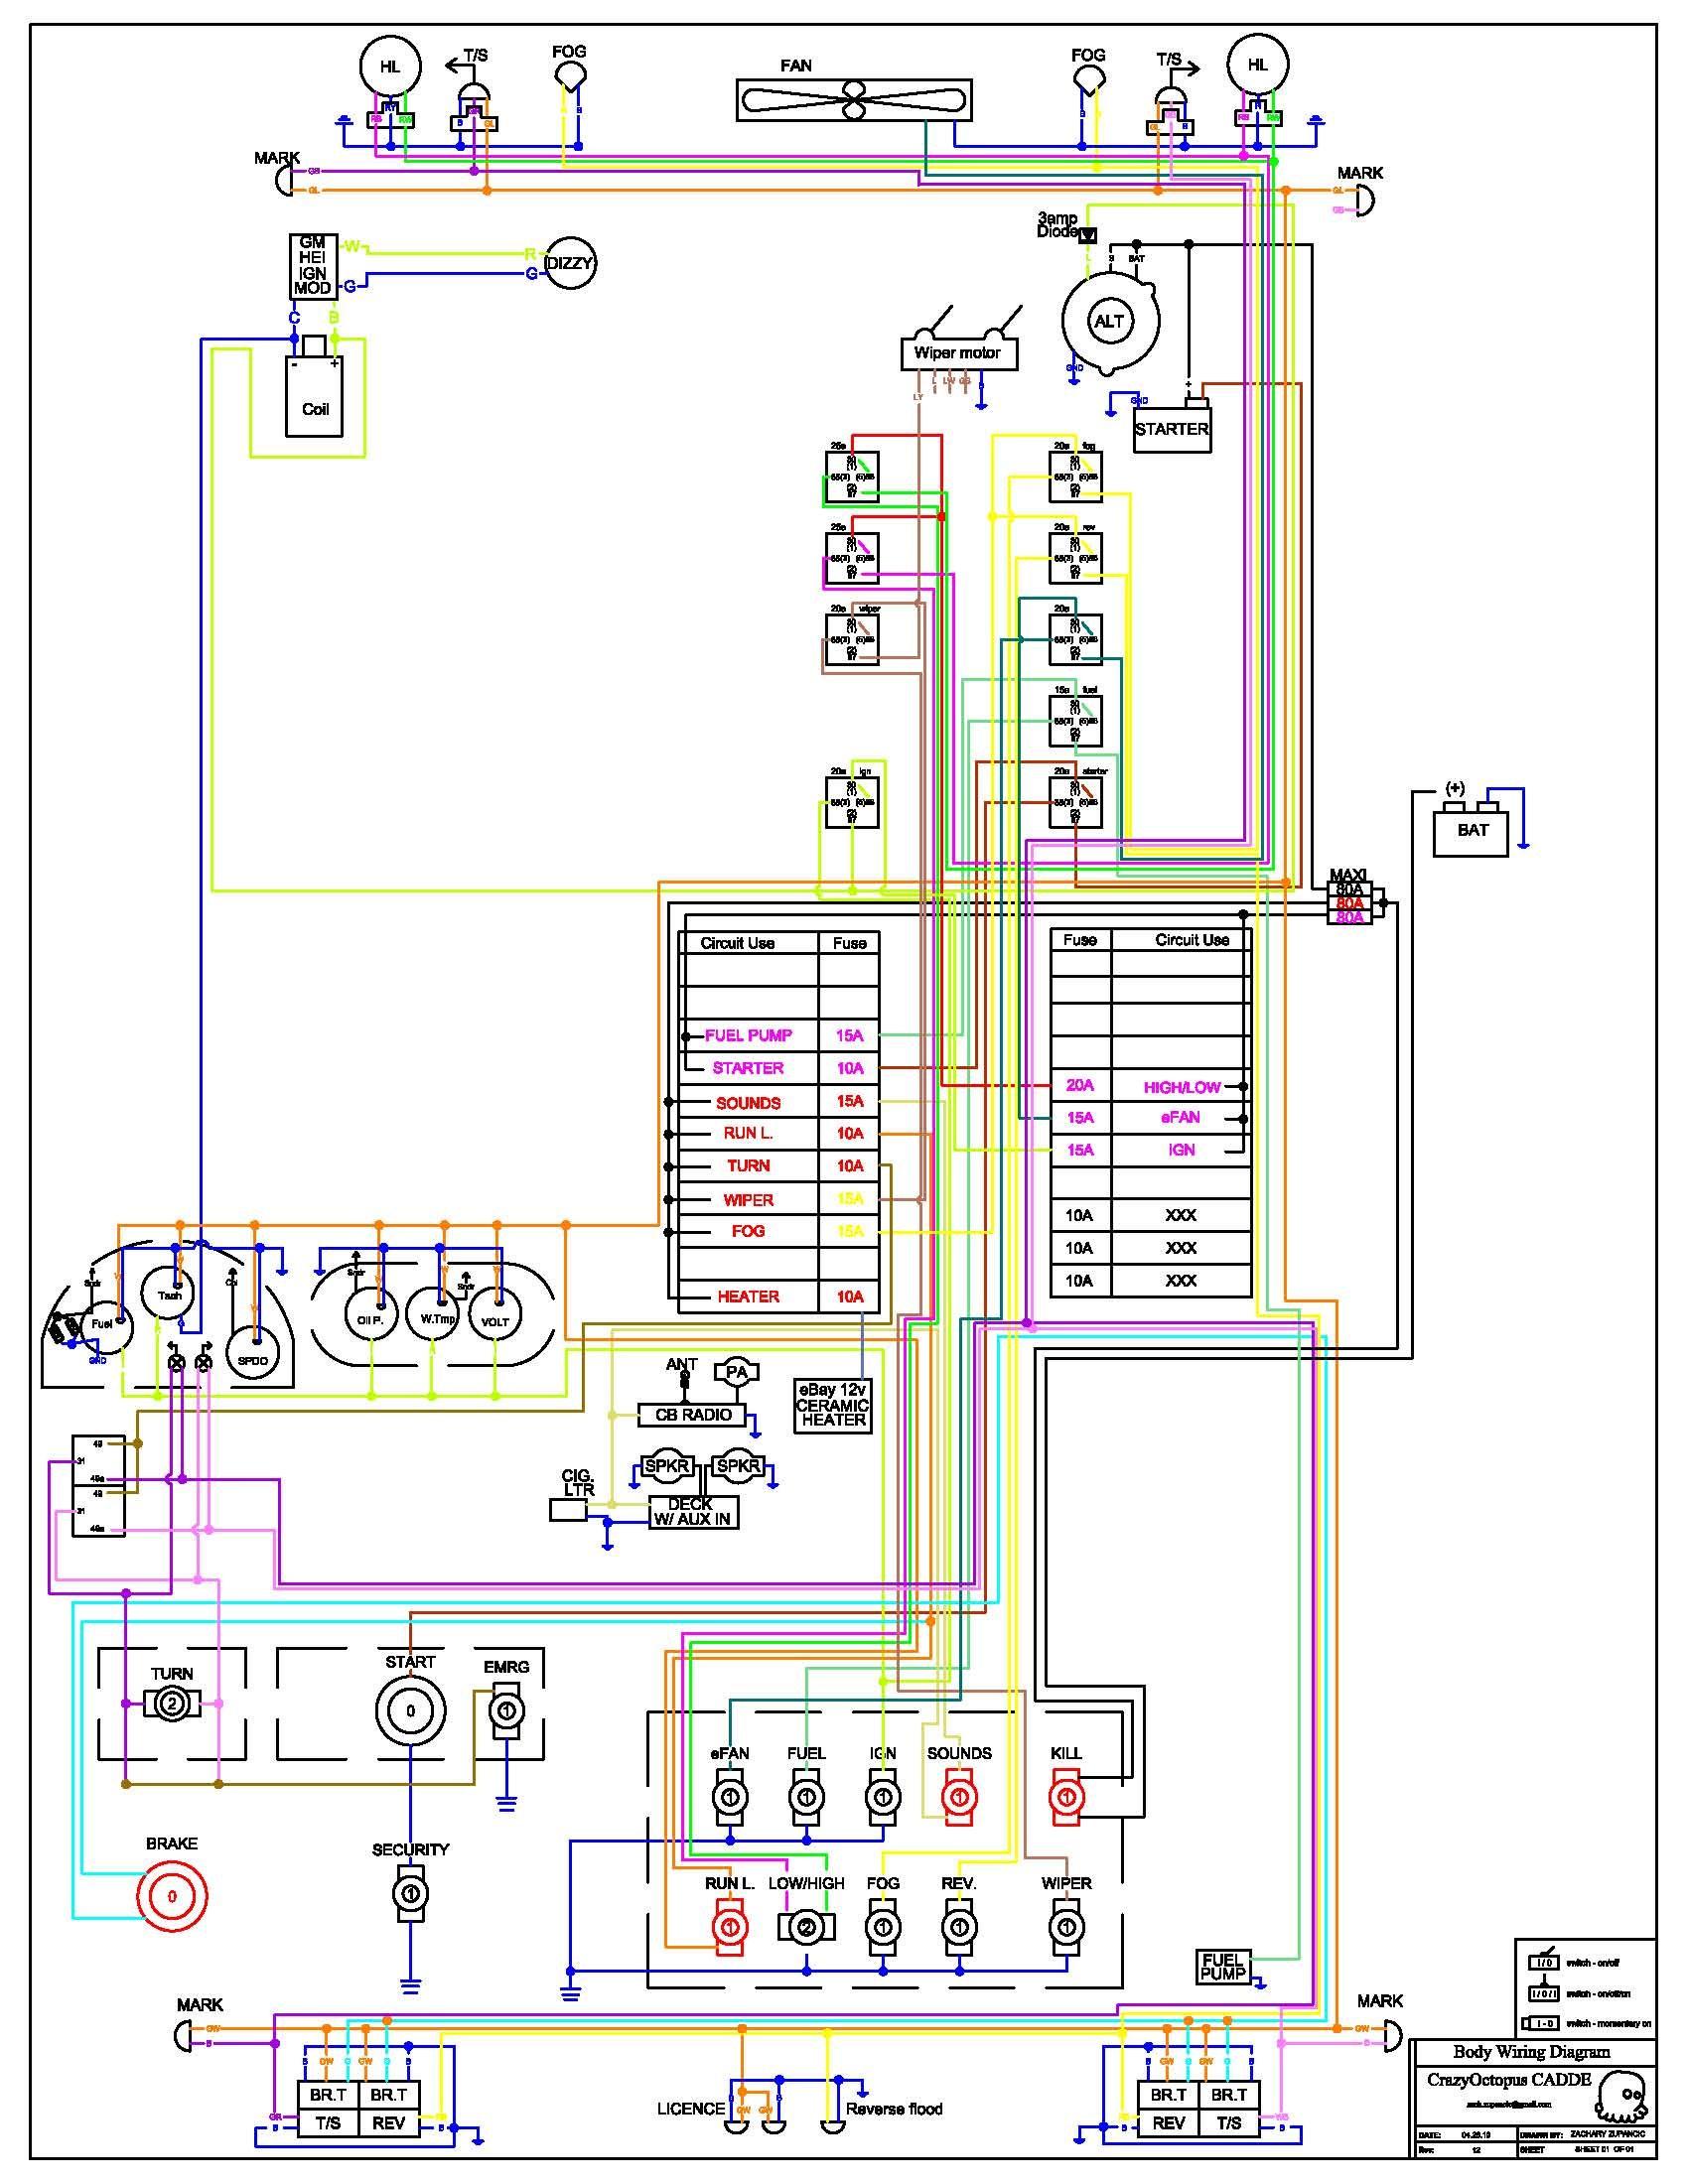 WW_3490] Basic Race Car Wiring SchematicDrosi Numap Mohammedshrine Librar Wiring 101